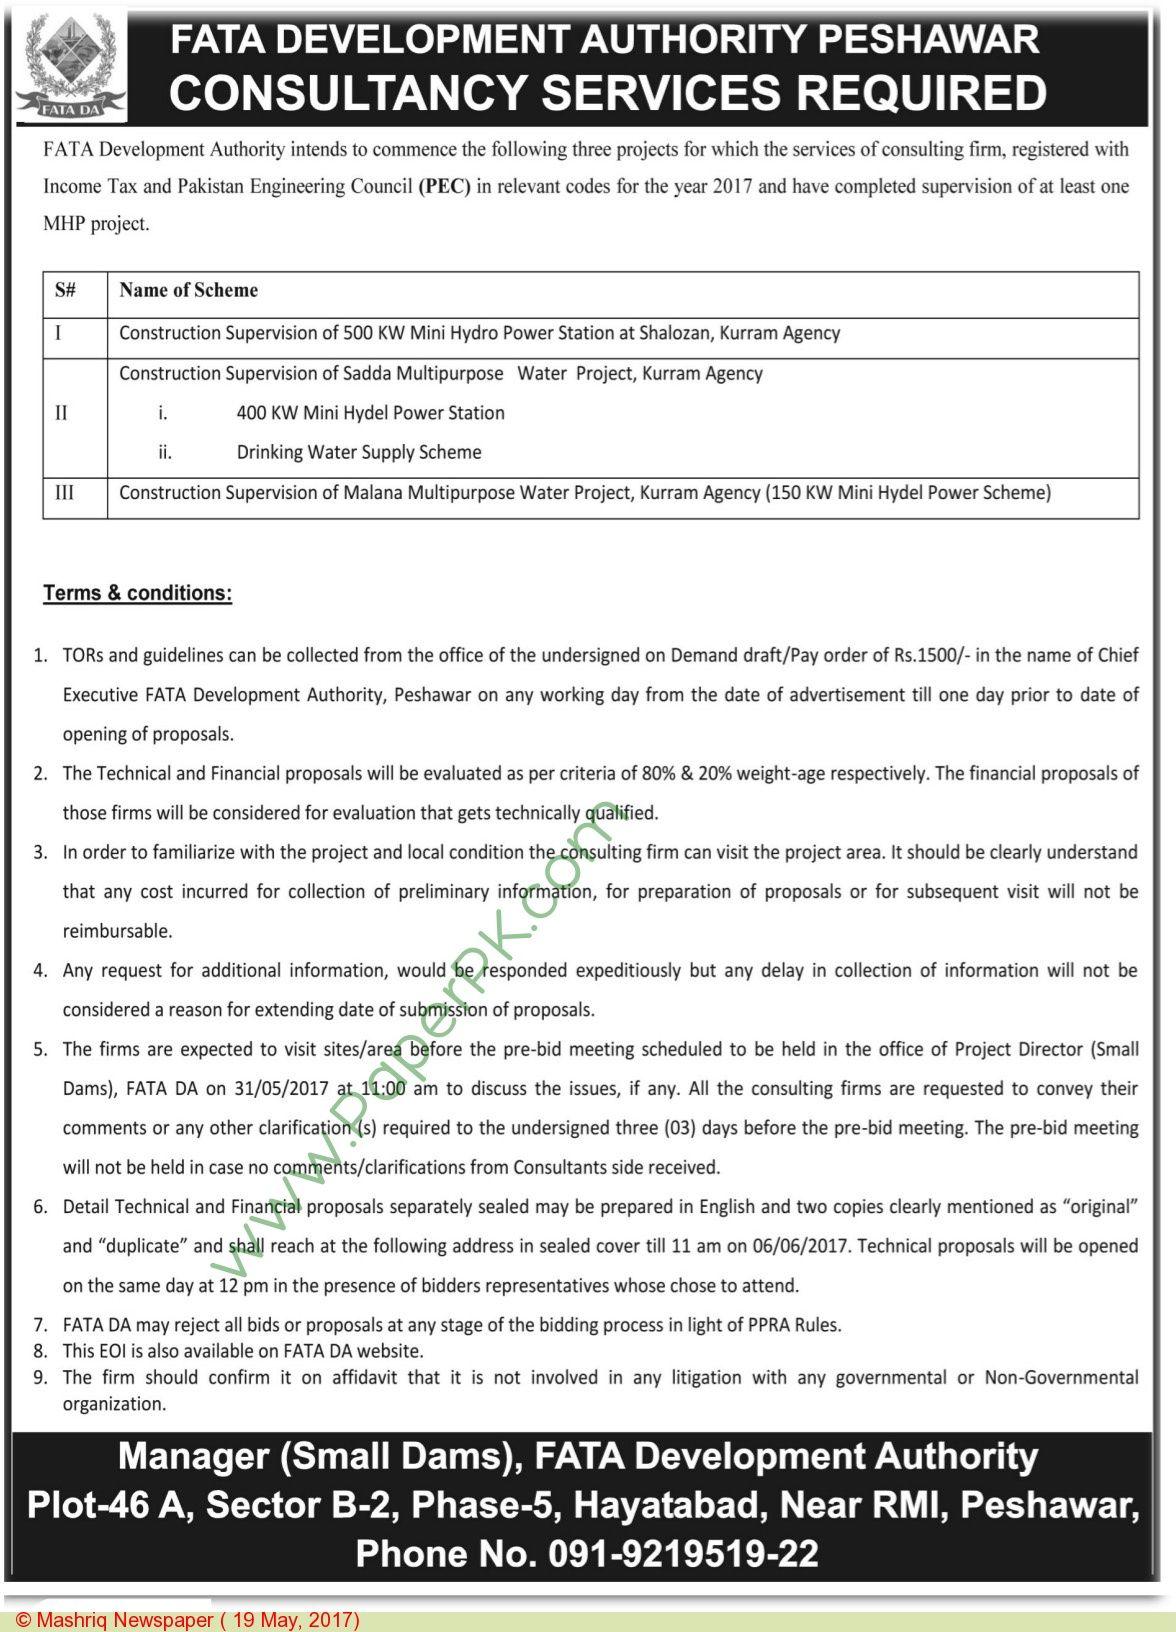 Fata Development Authority Peshawar Jobs  Jobs In Pakistan